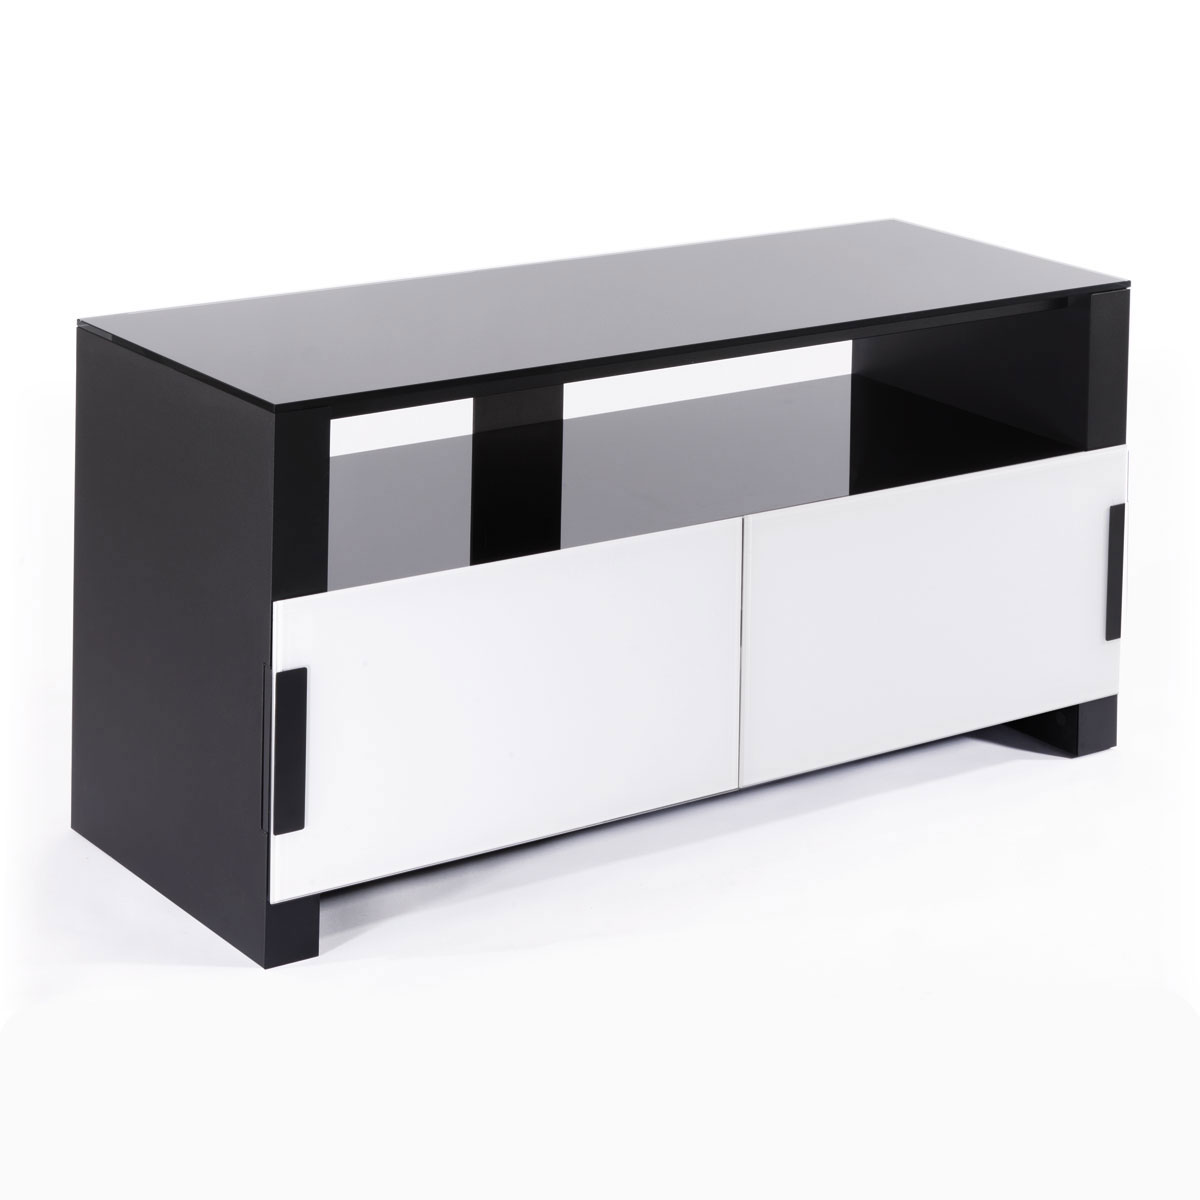 Erard Bilt1100 Blanc Meuble Tv Erard Group Sur Ldlc Com # Meuble Tv Ubaldi